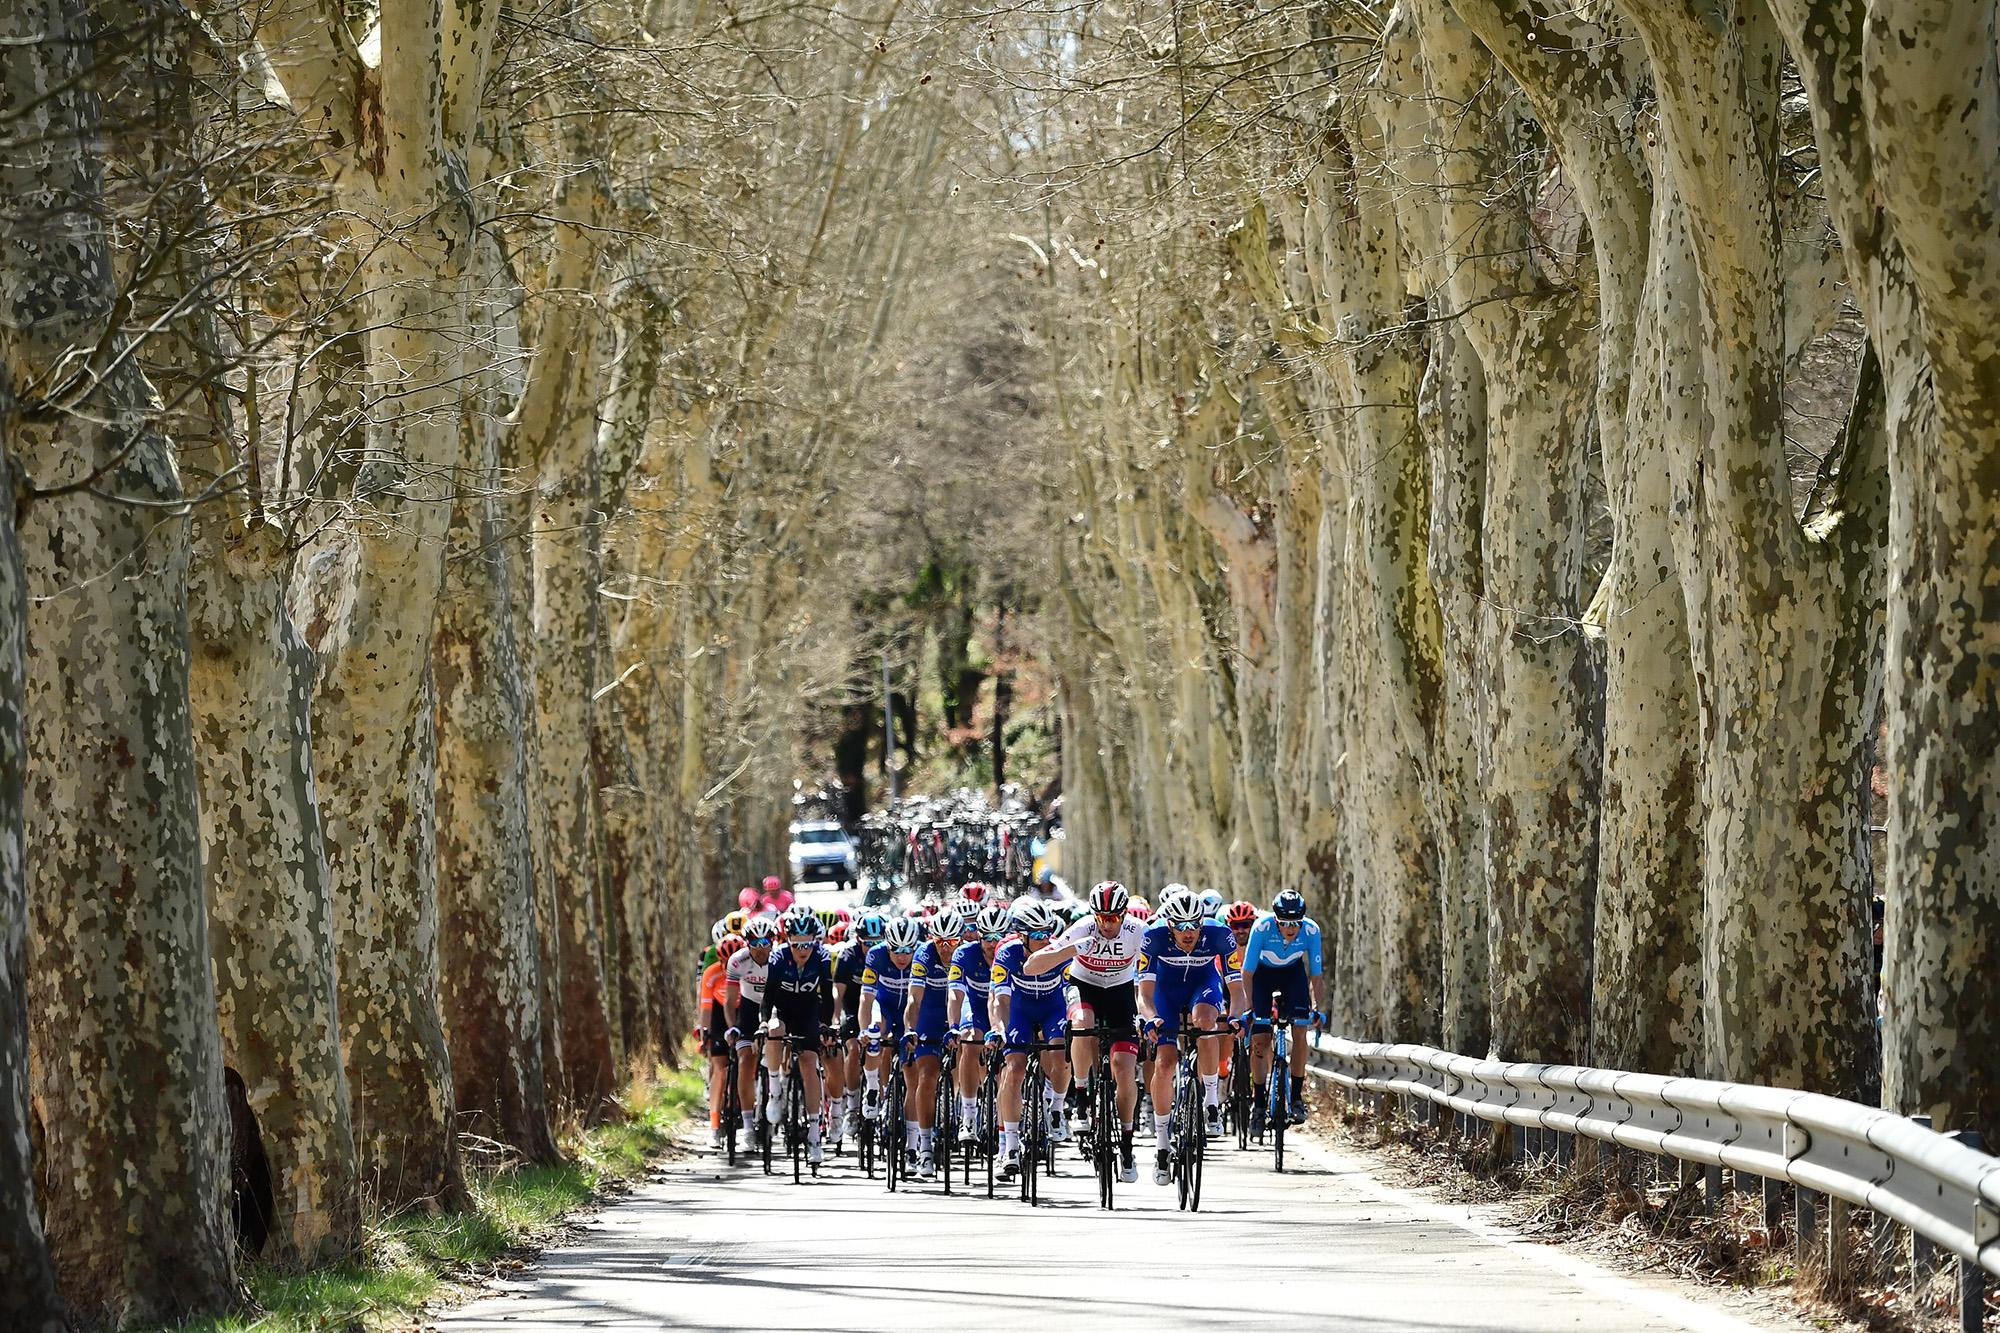 Paris-Nice 2019 - 2019/03/15 - Etape 6 - Peynier / Brignoles (176.5 km) - Peloton scinde en plusieurs groupes